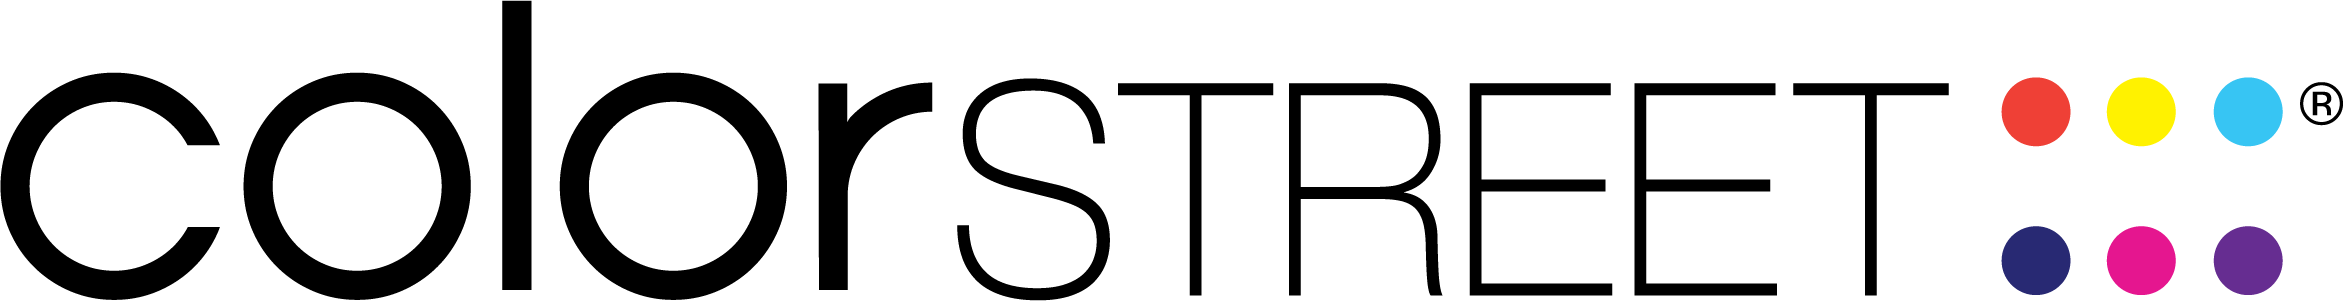 CS Logo - Horizontal (1) - Tricia McNamara.png